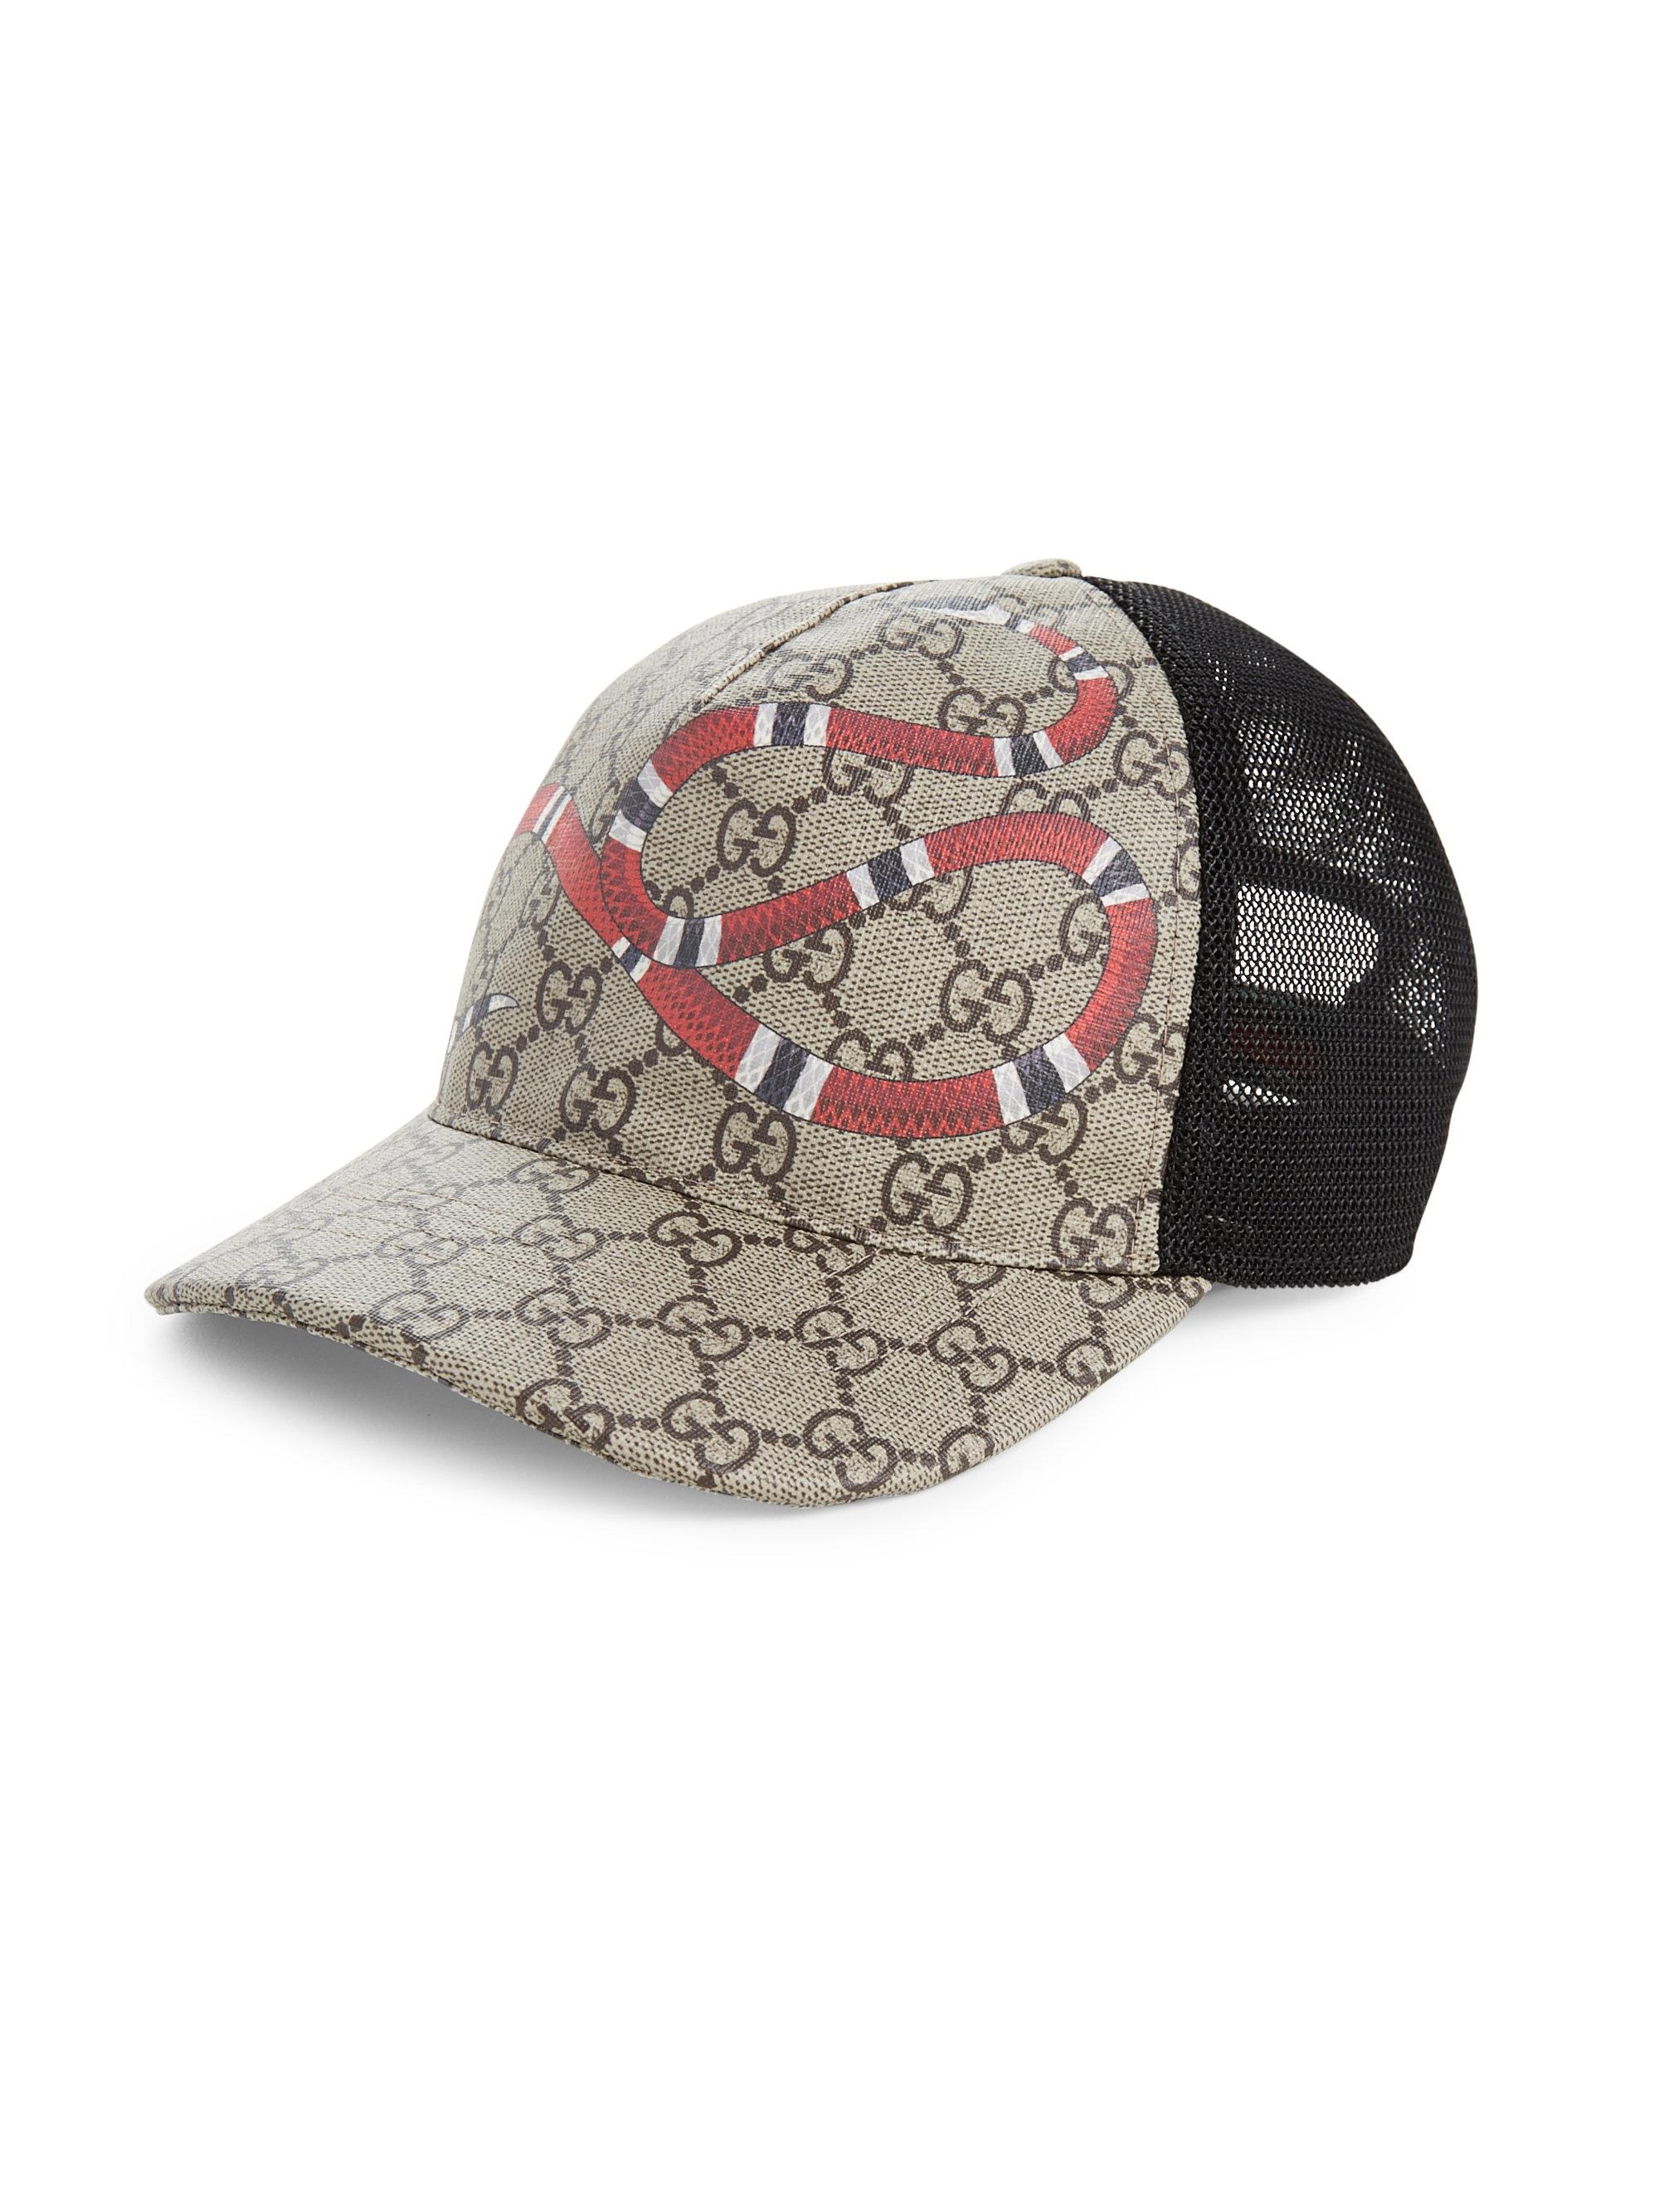 d2e25ea7811 Gucci Original GG Canvas Baseball Hat with Web Fashion Hat in